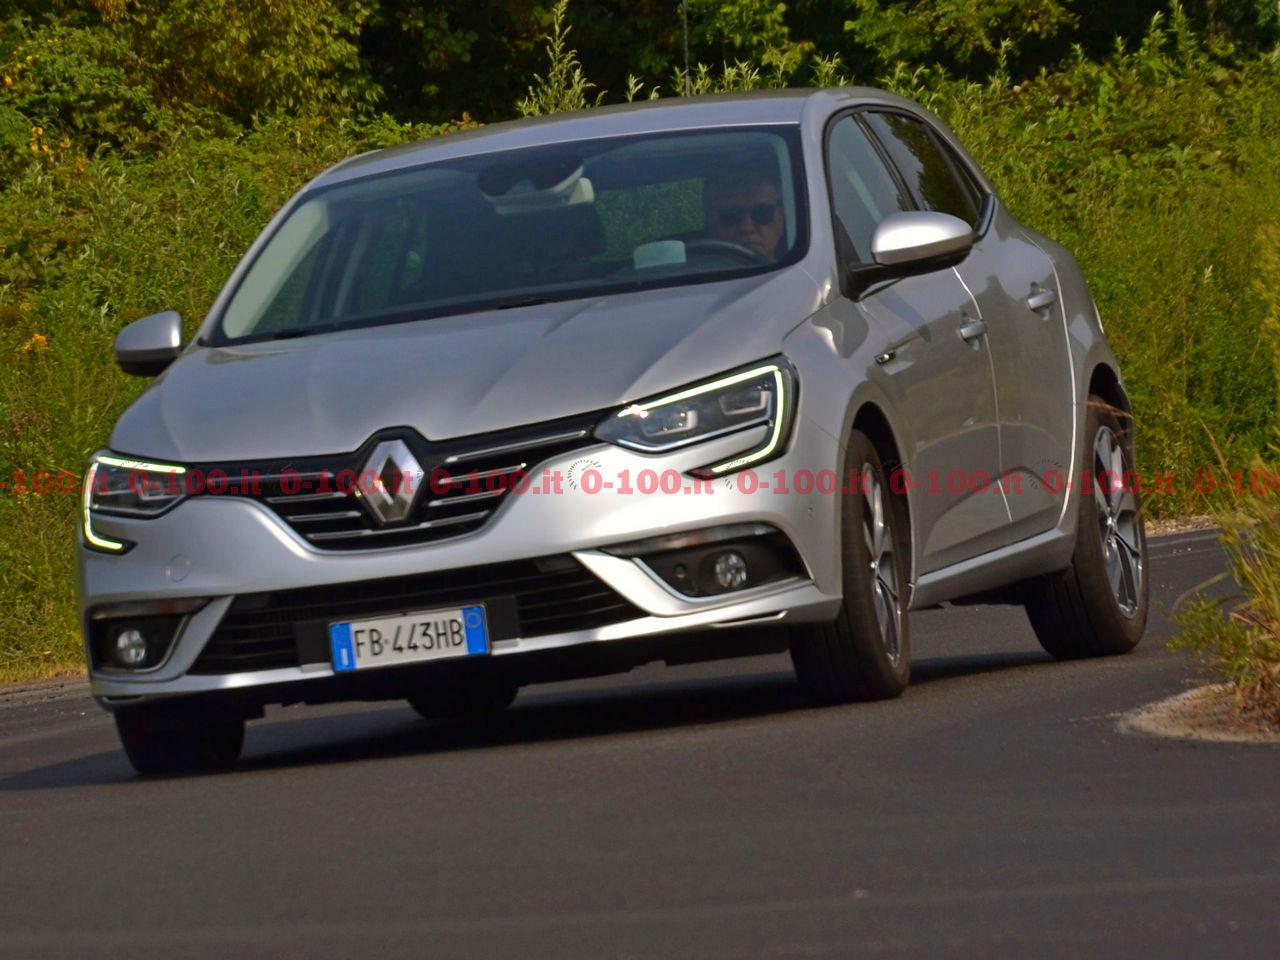 Renault-Megane-GT-Bose-dCi-130-test-prova-opinioni_0-100_15